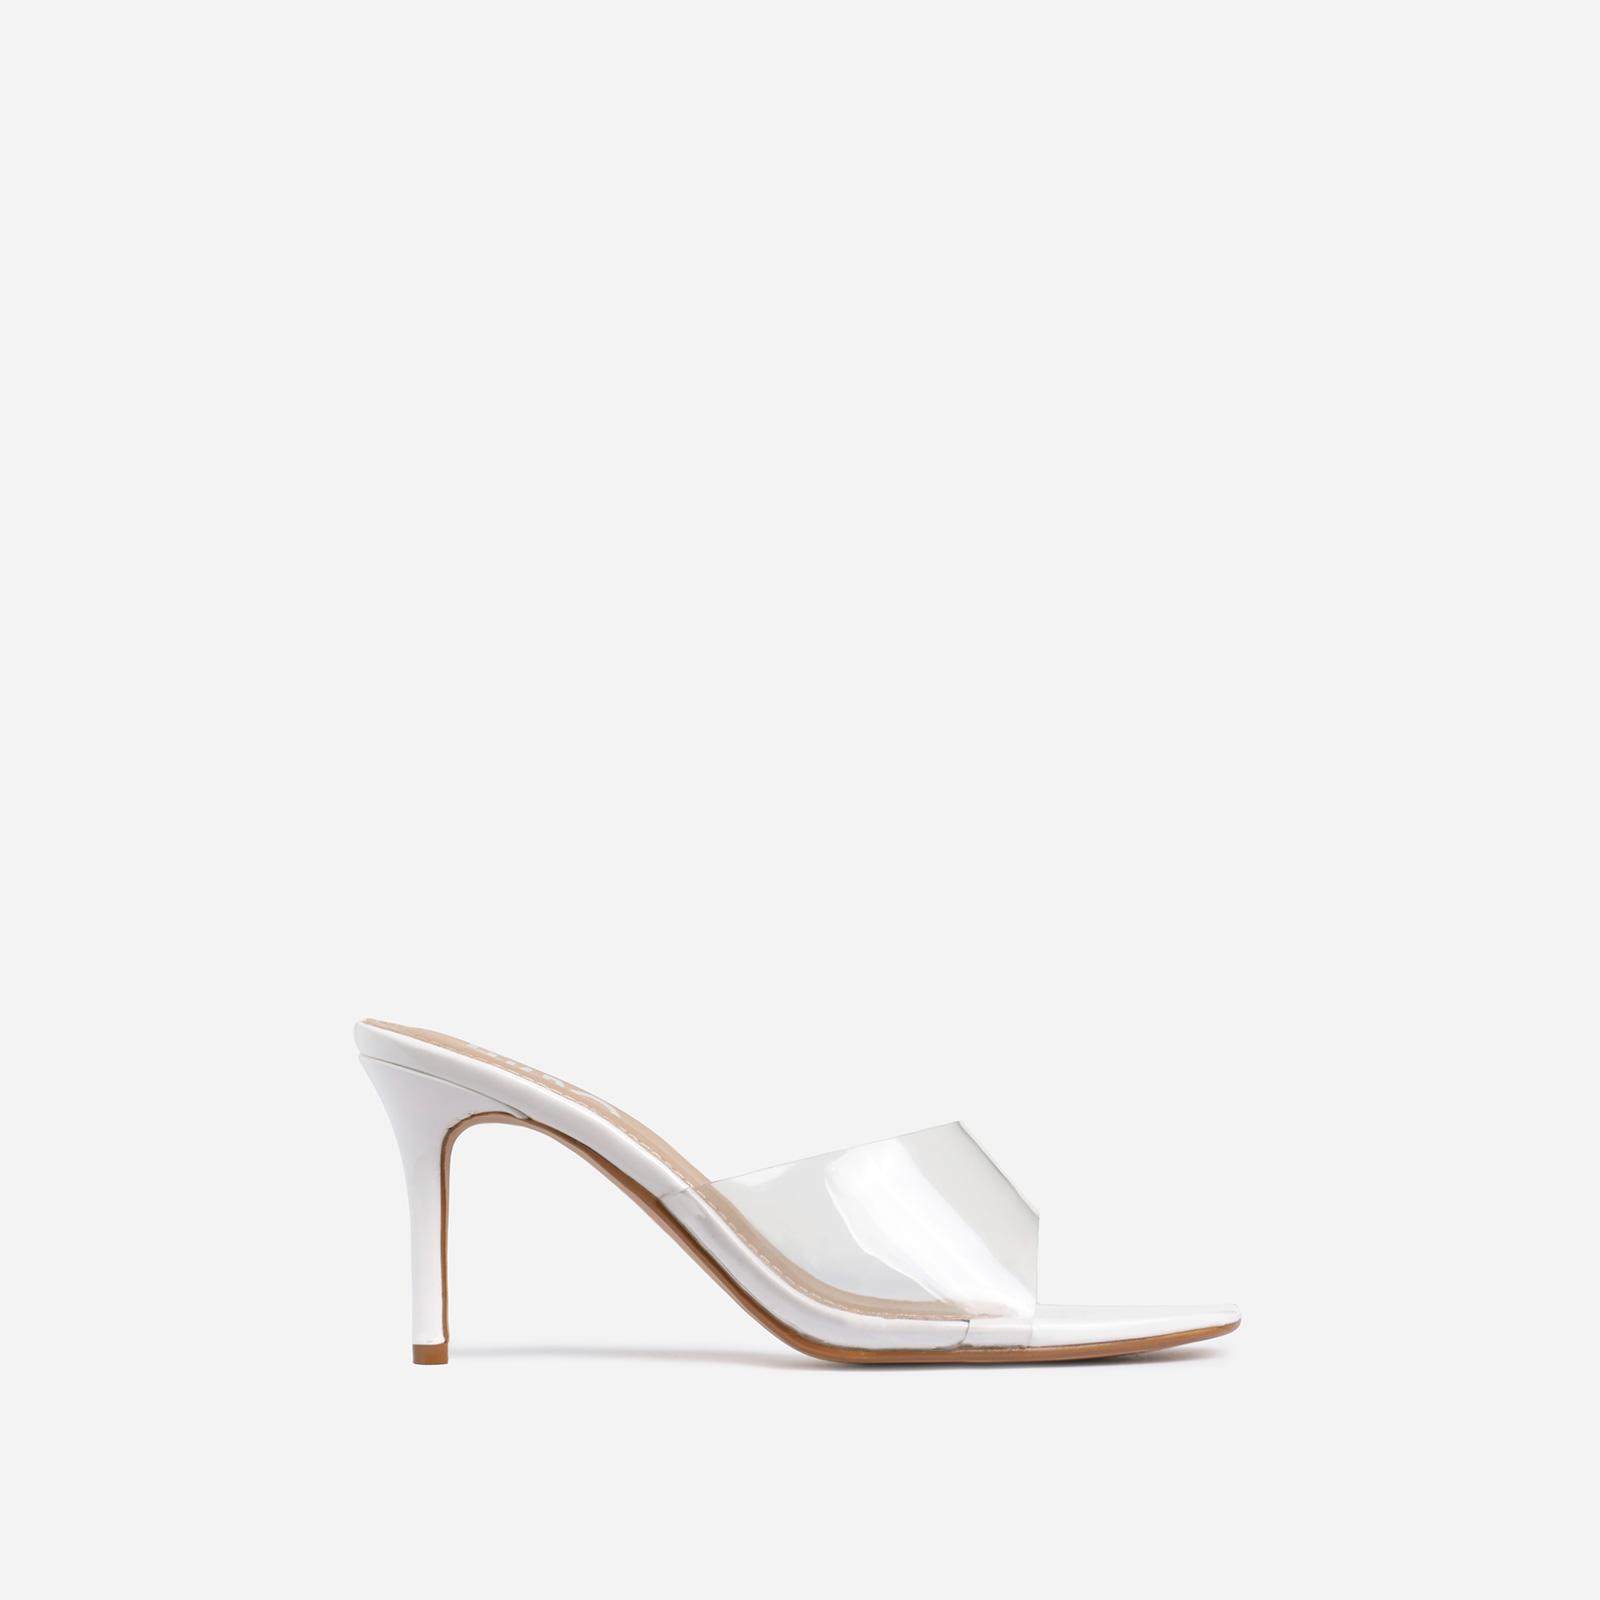 Rexa Square Peep Toe Clear Perspex Kitten Heel Mule In White Patent